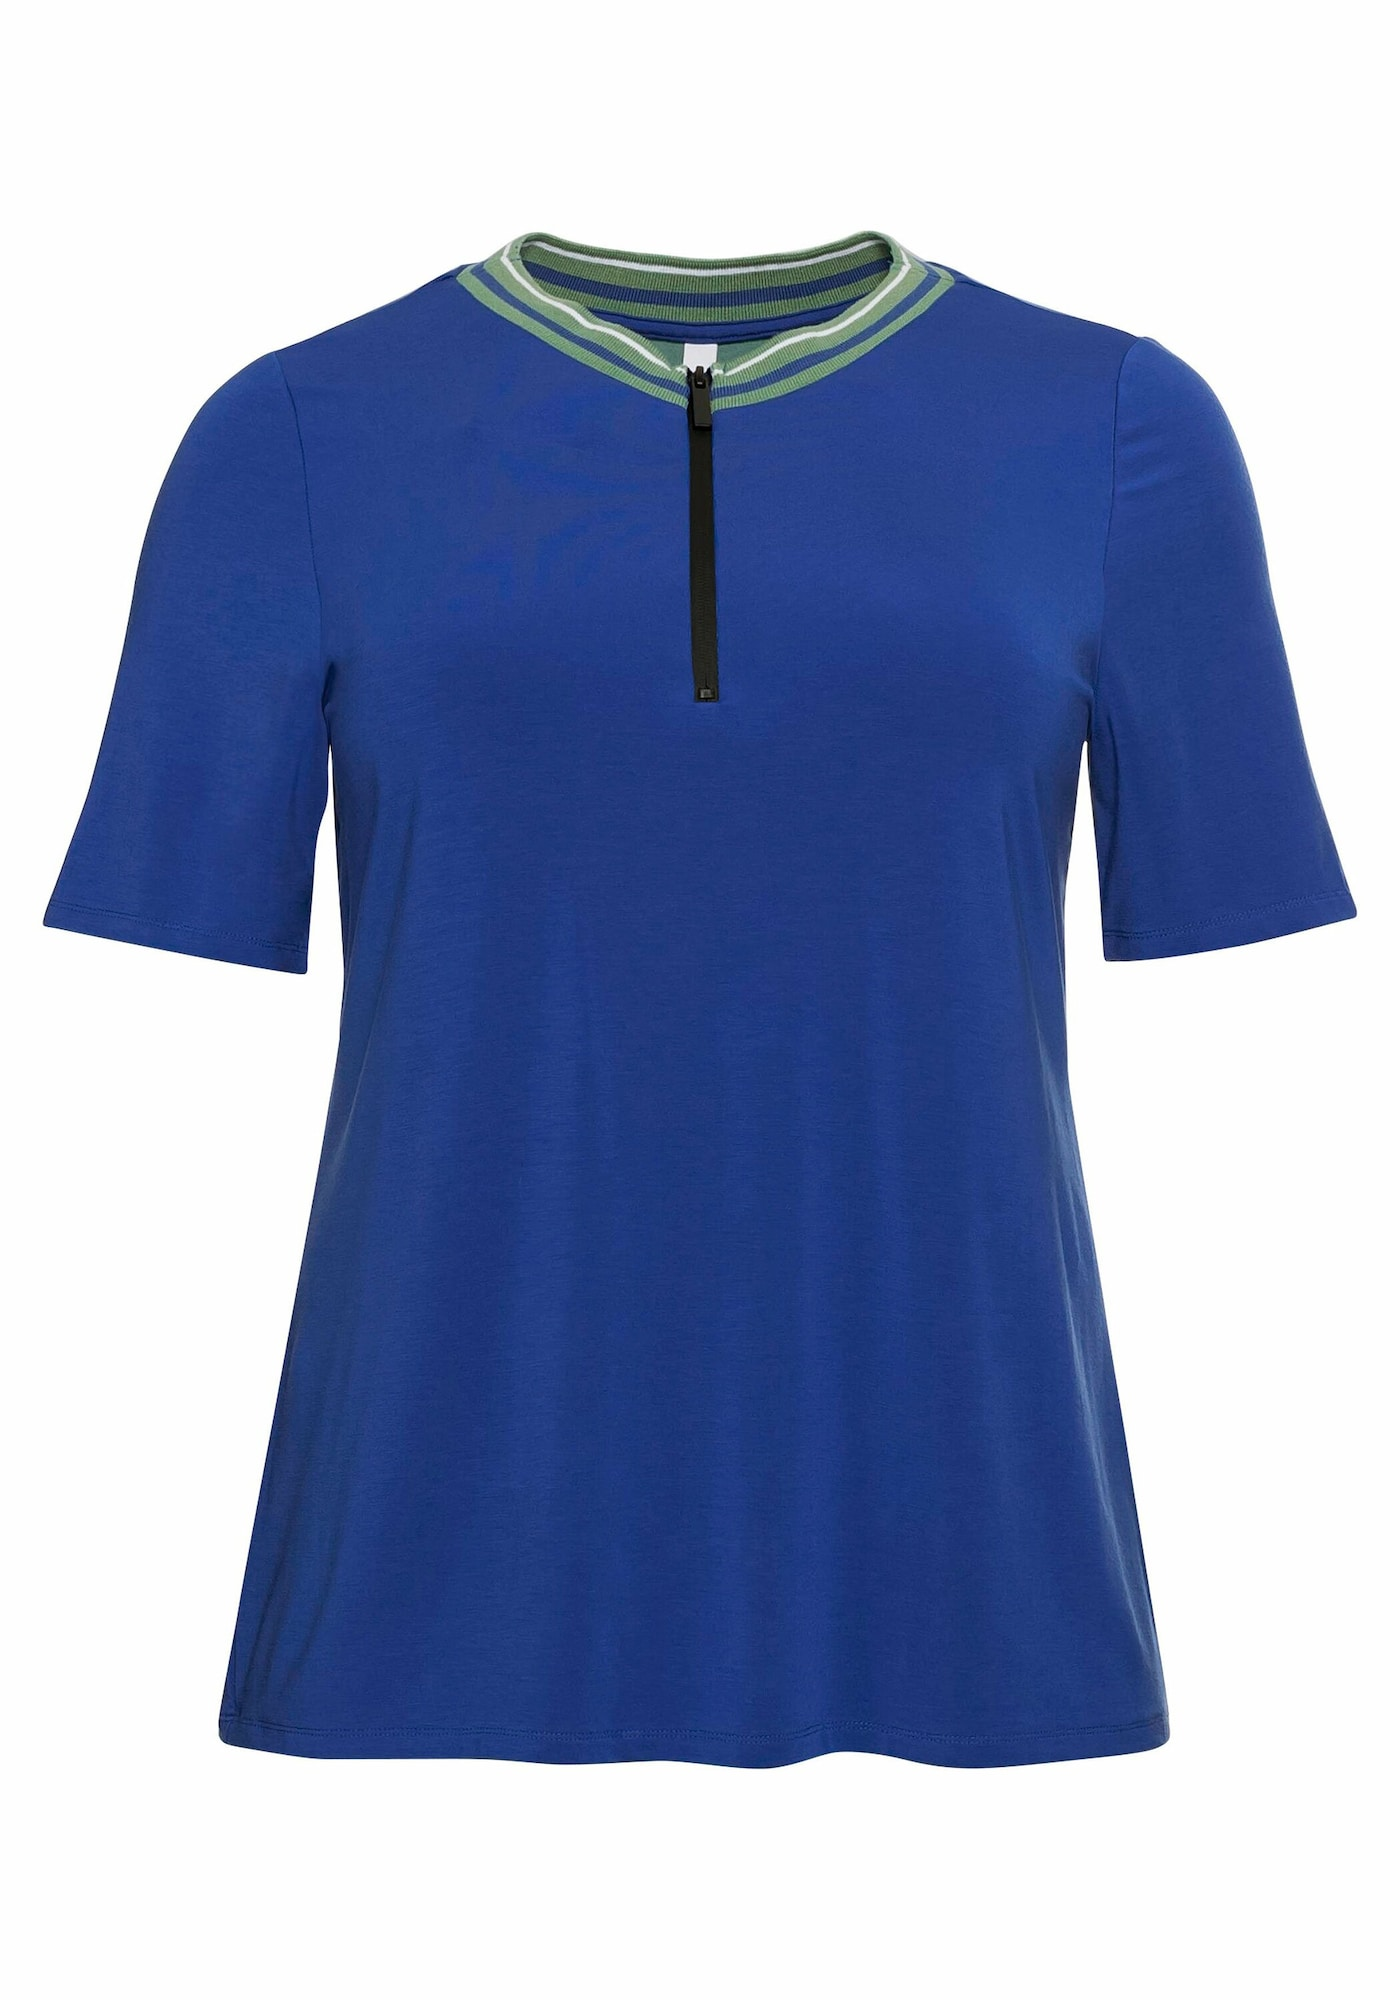 "SHEEGO Marškinėliai sodri mėlyna (""karališka"")"